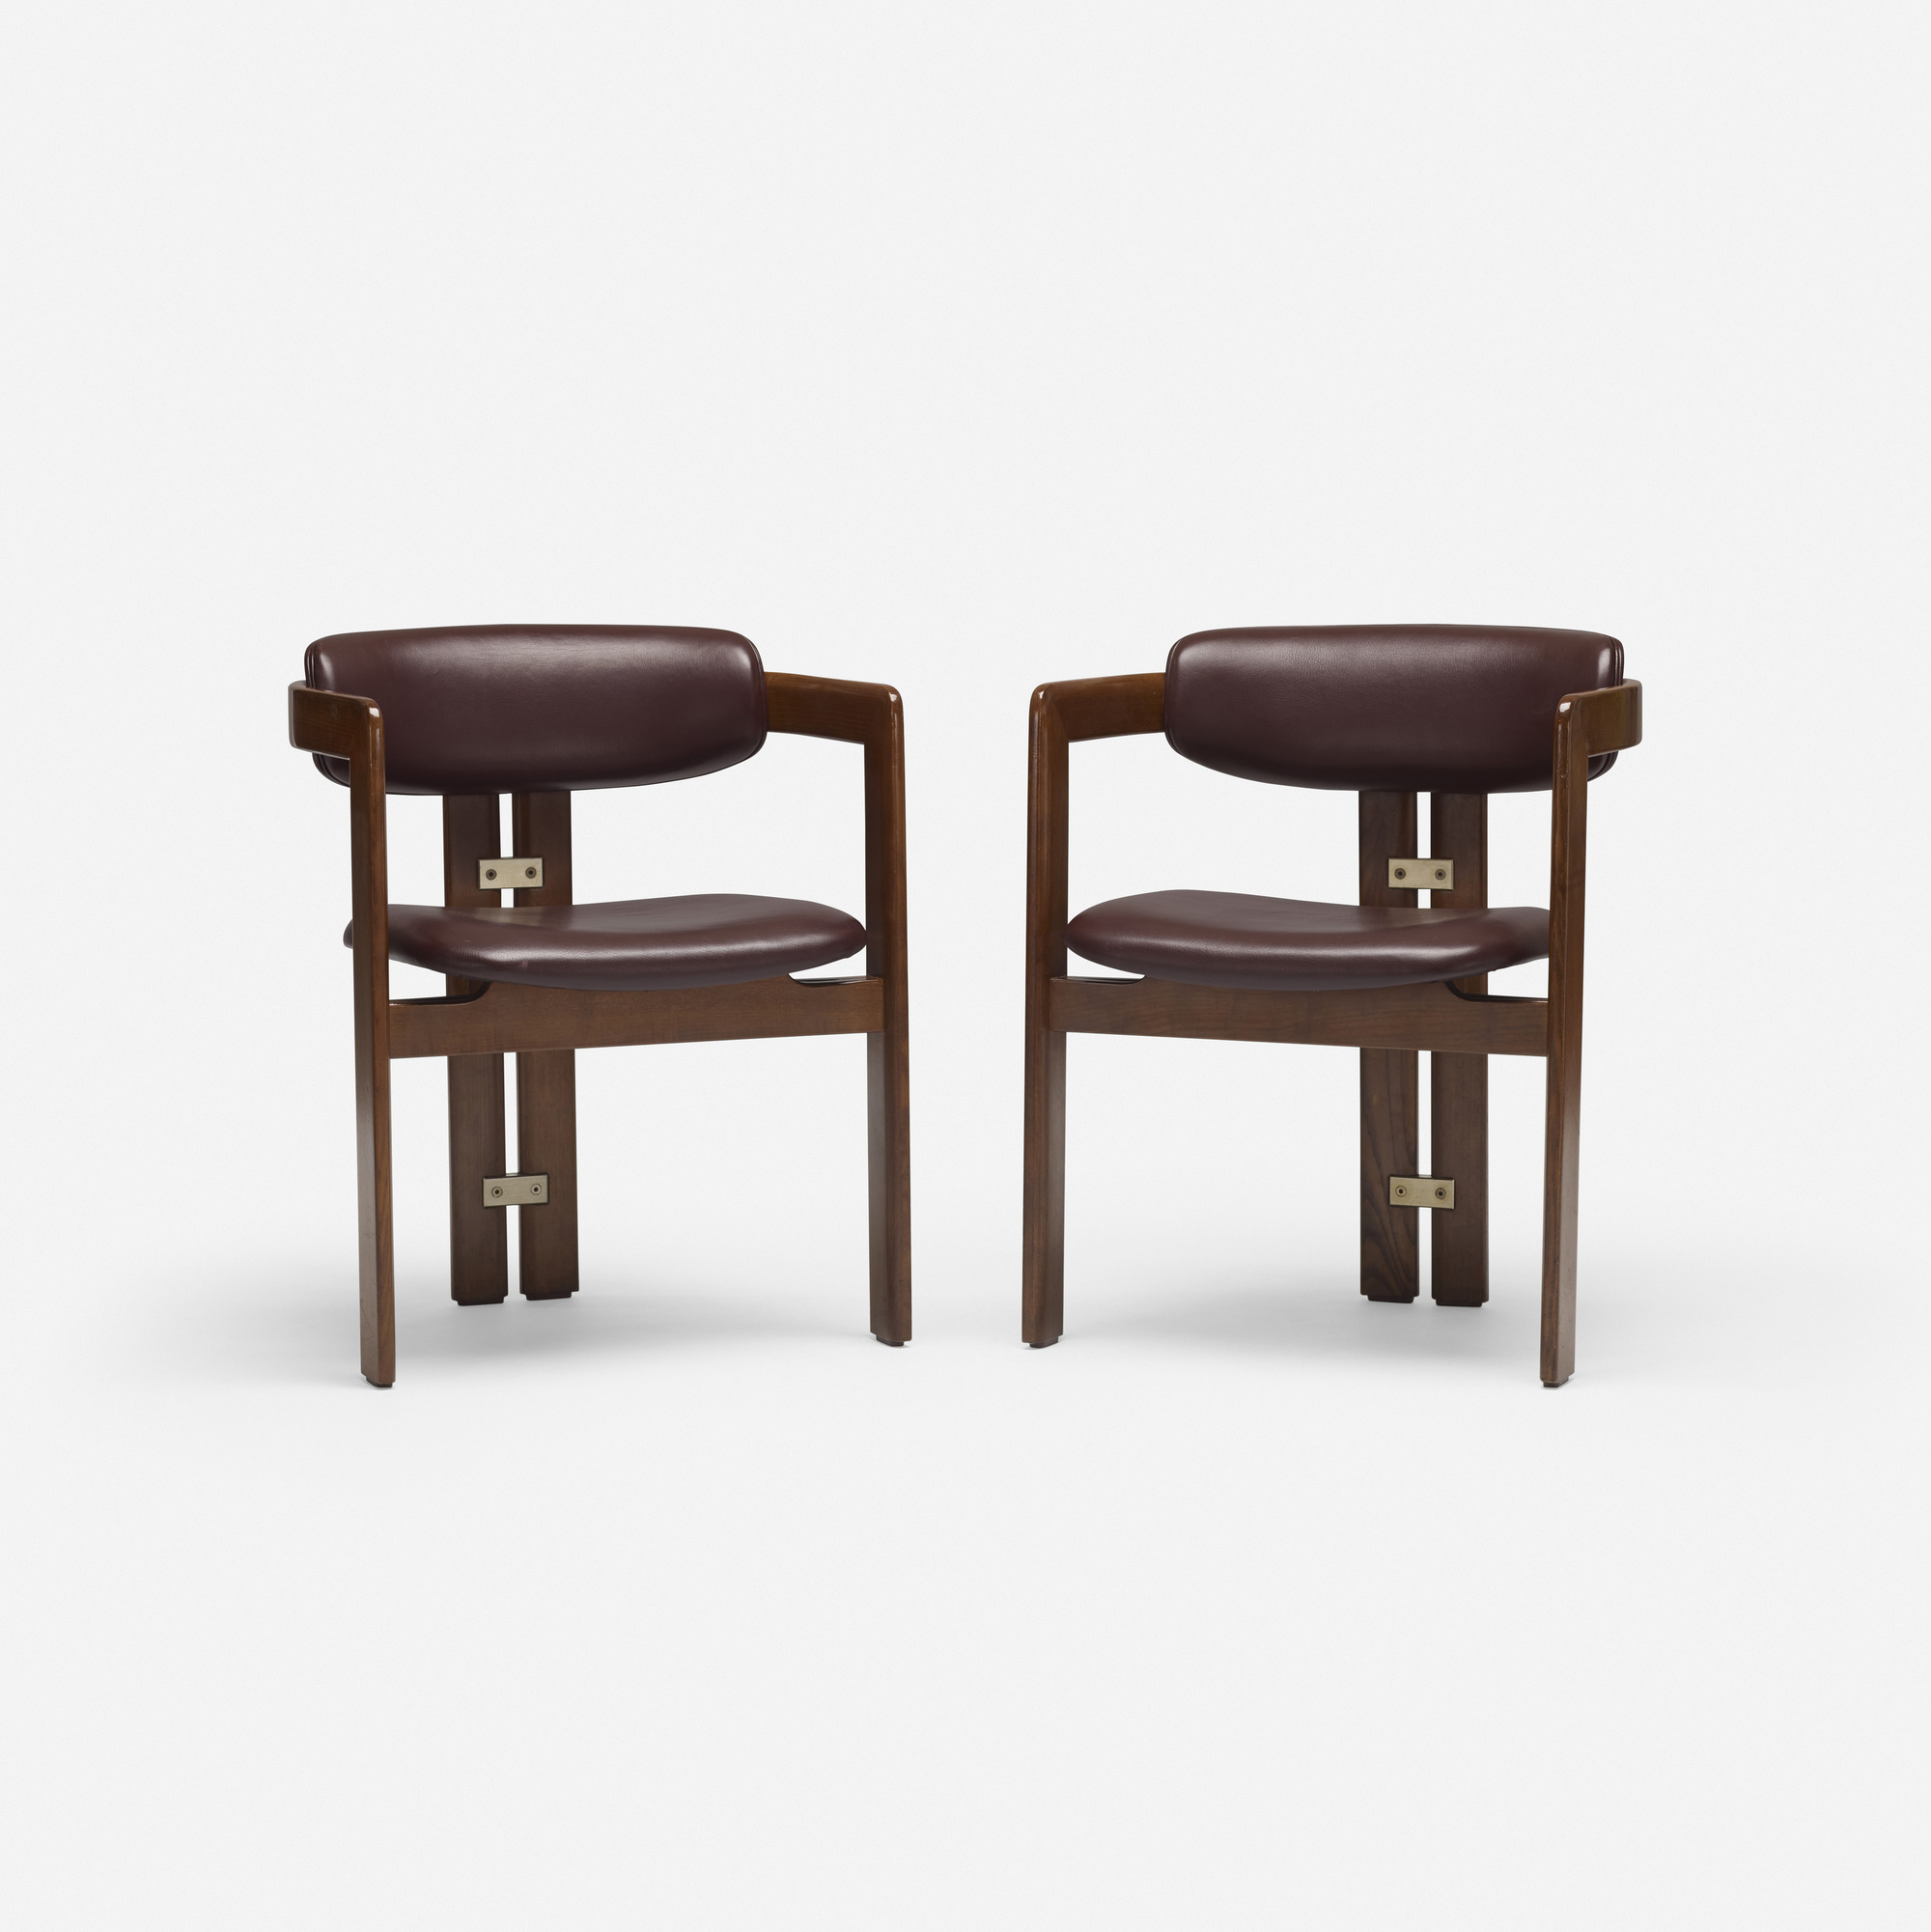 711: Augusto Savini / Pamplona dining chairs, pair (3 of 4)